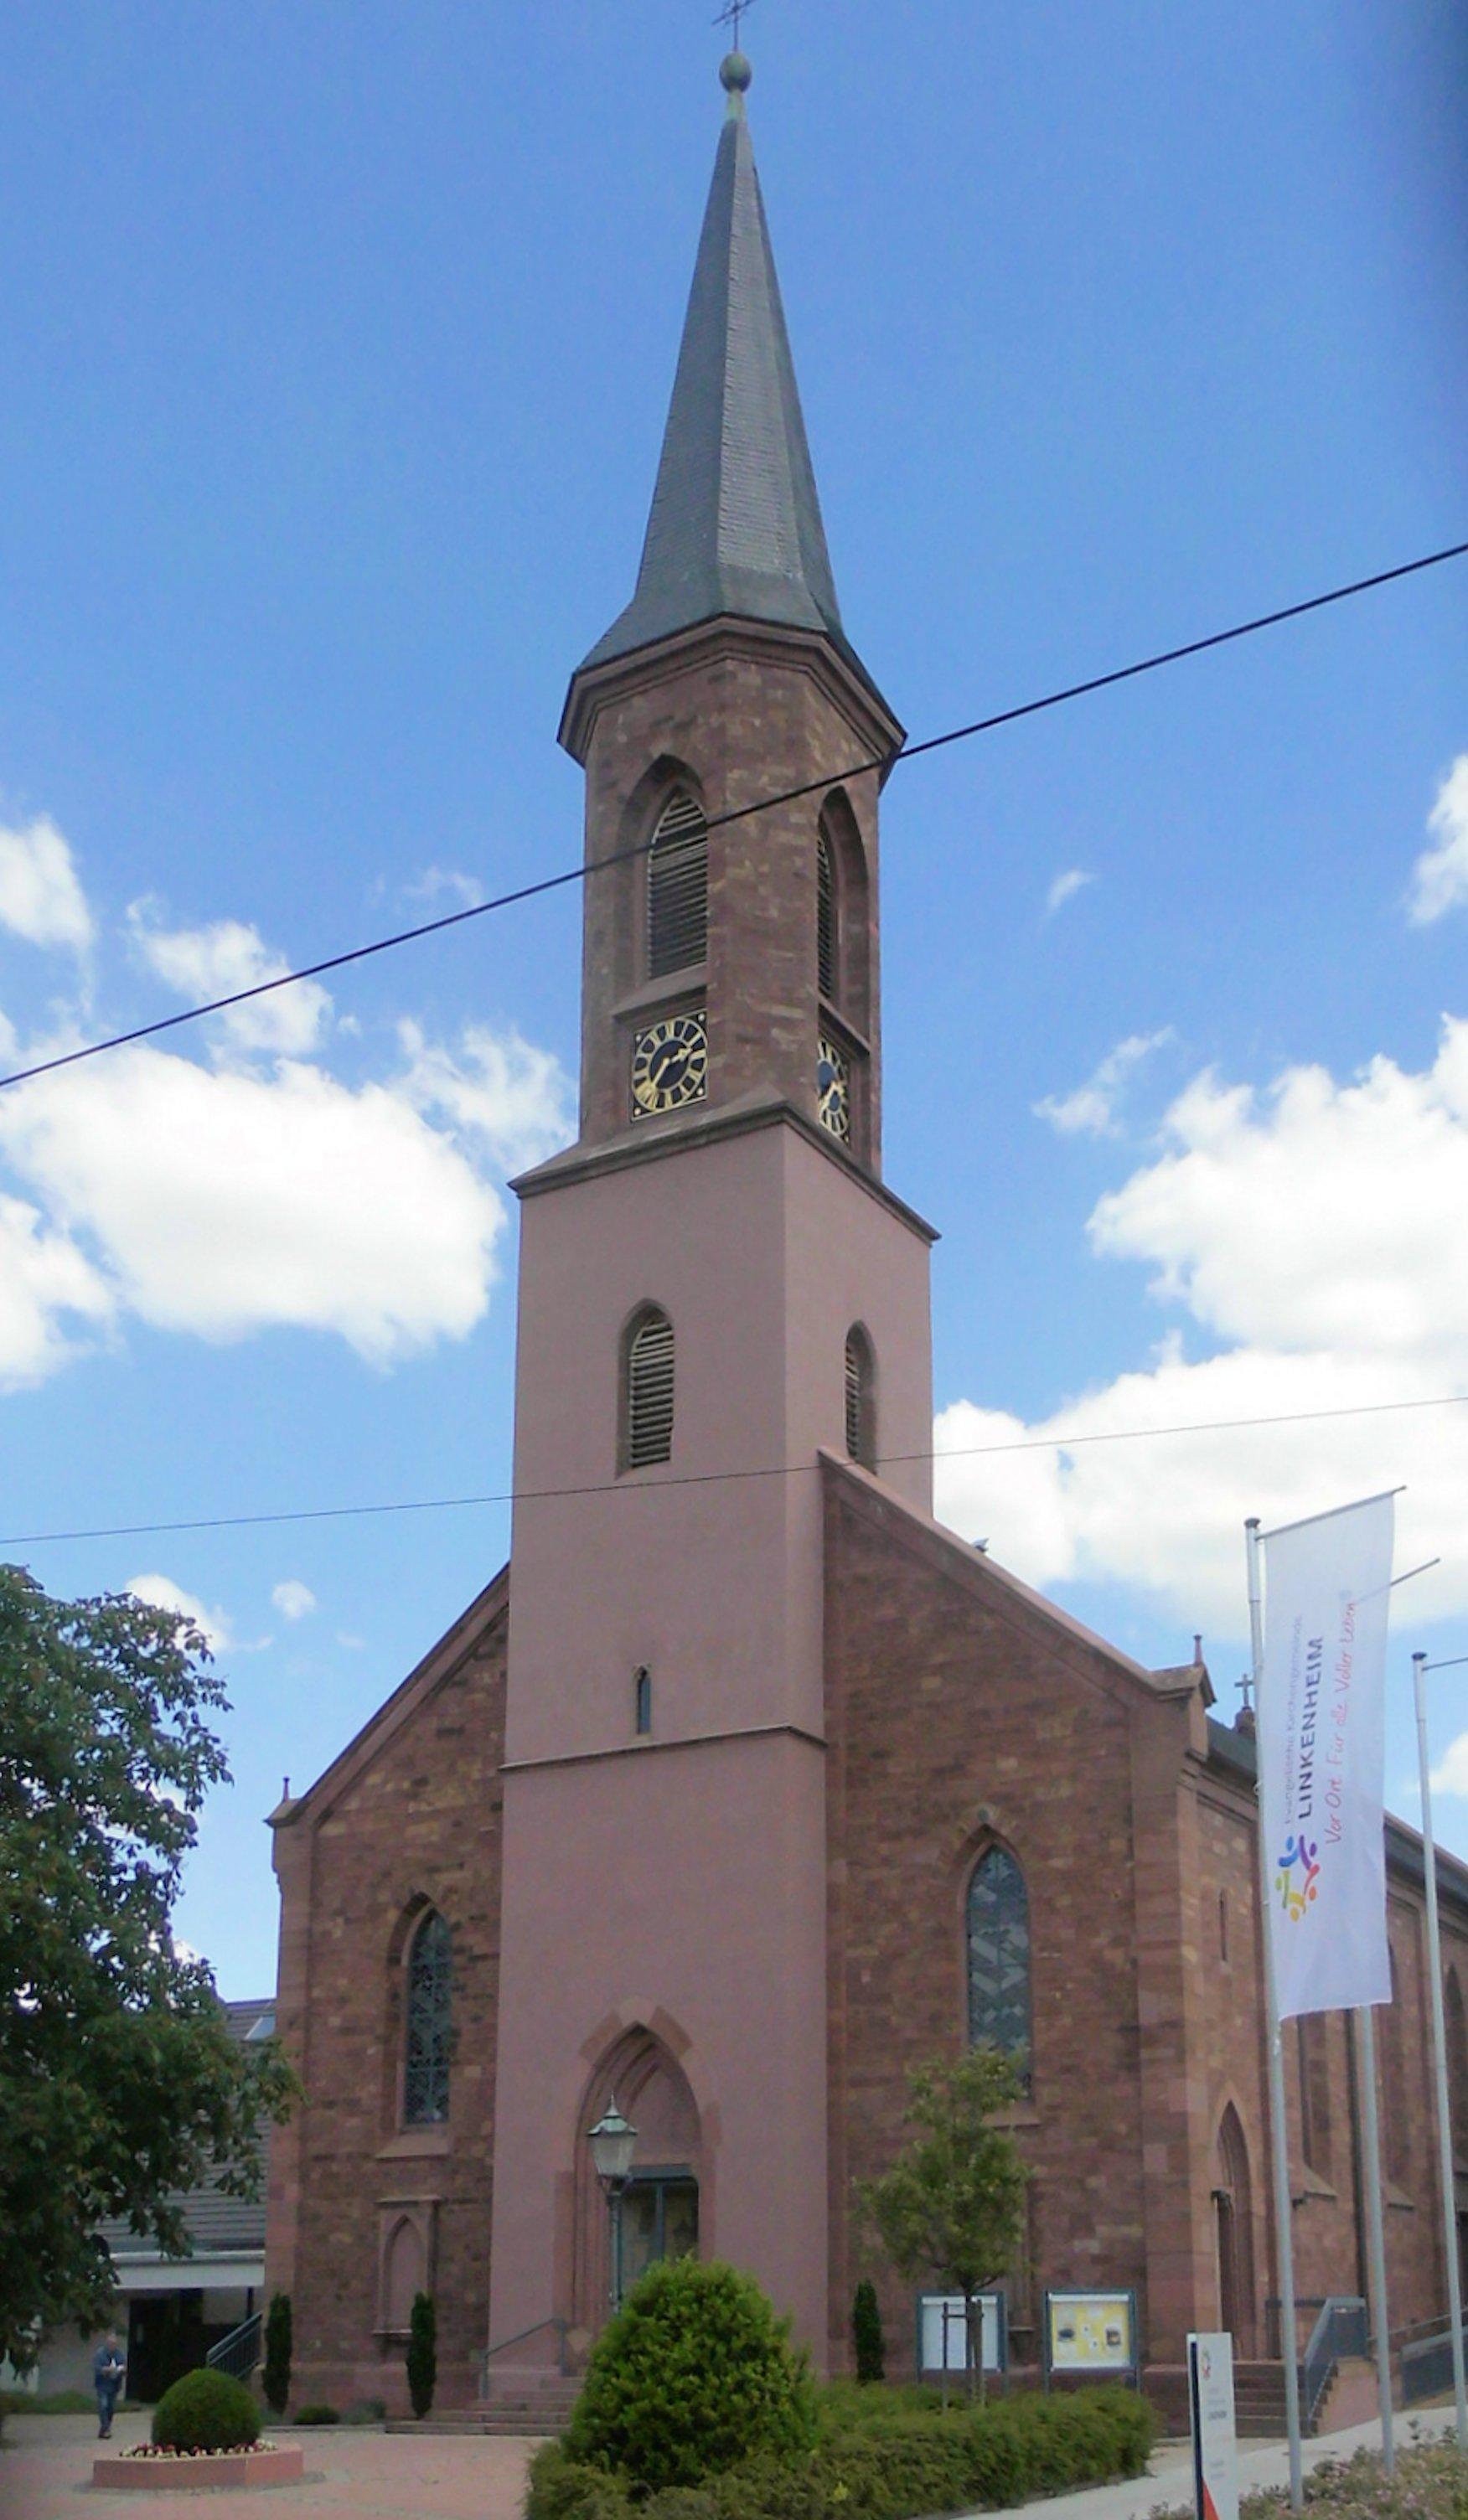 File:Linkenheim, Evangelische Kirche.jpg - Wikimedia Commons